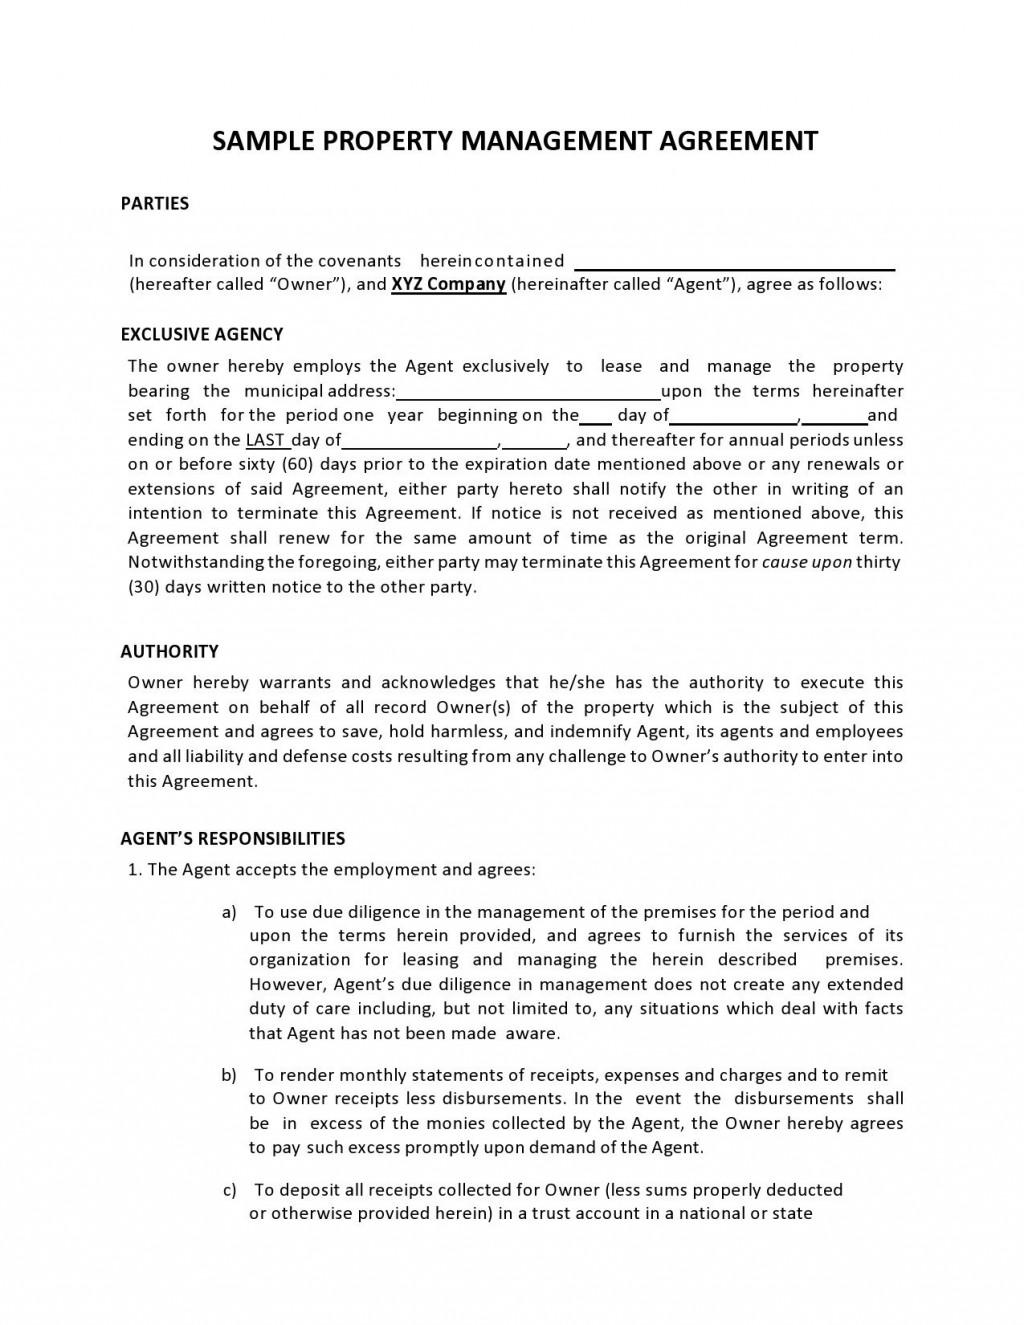 008 Singular Commercial Property Management Agreement Template Uk Highest Clarity Large